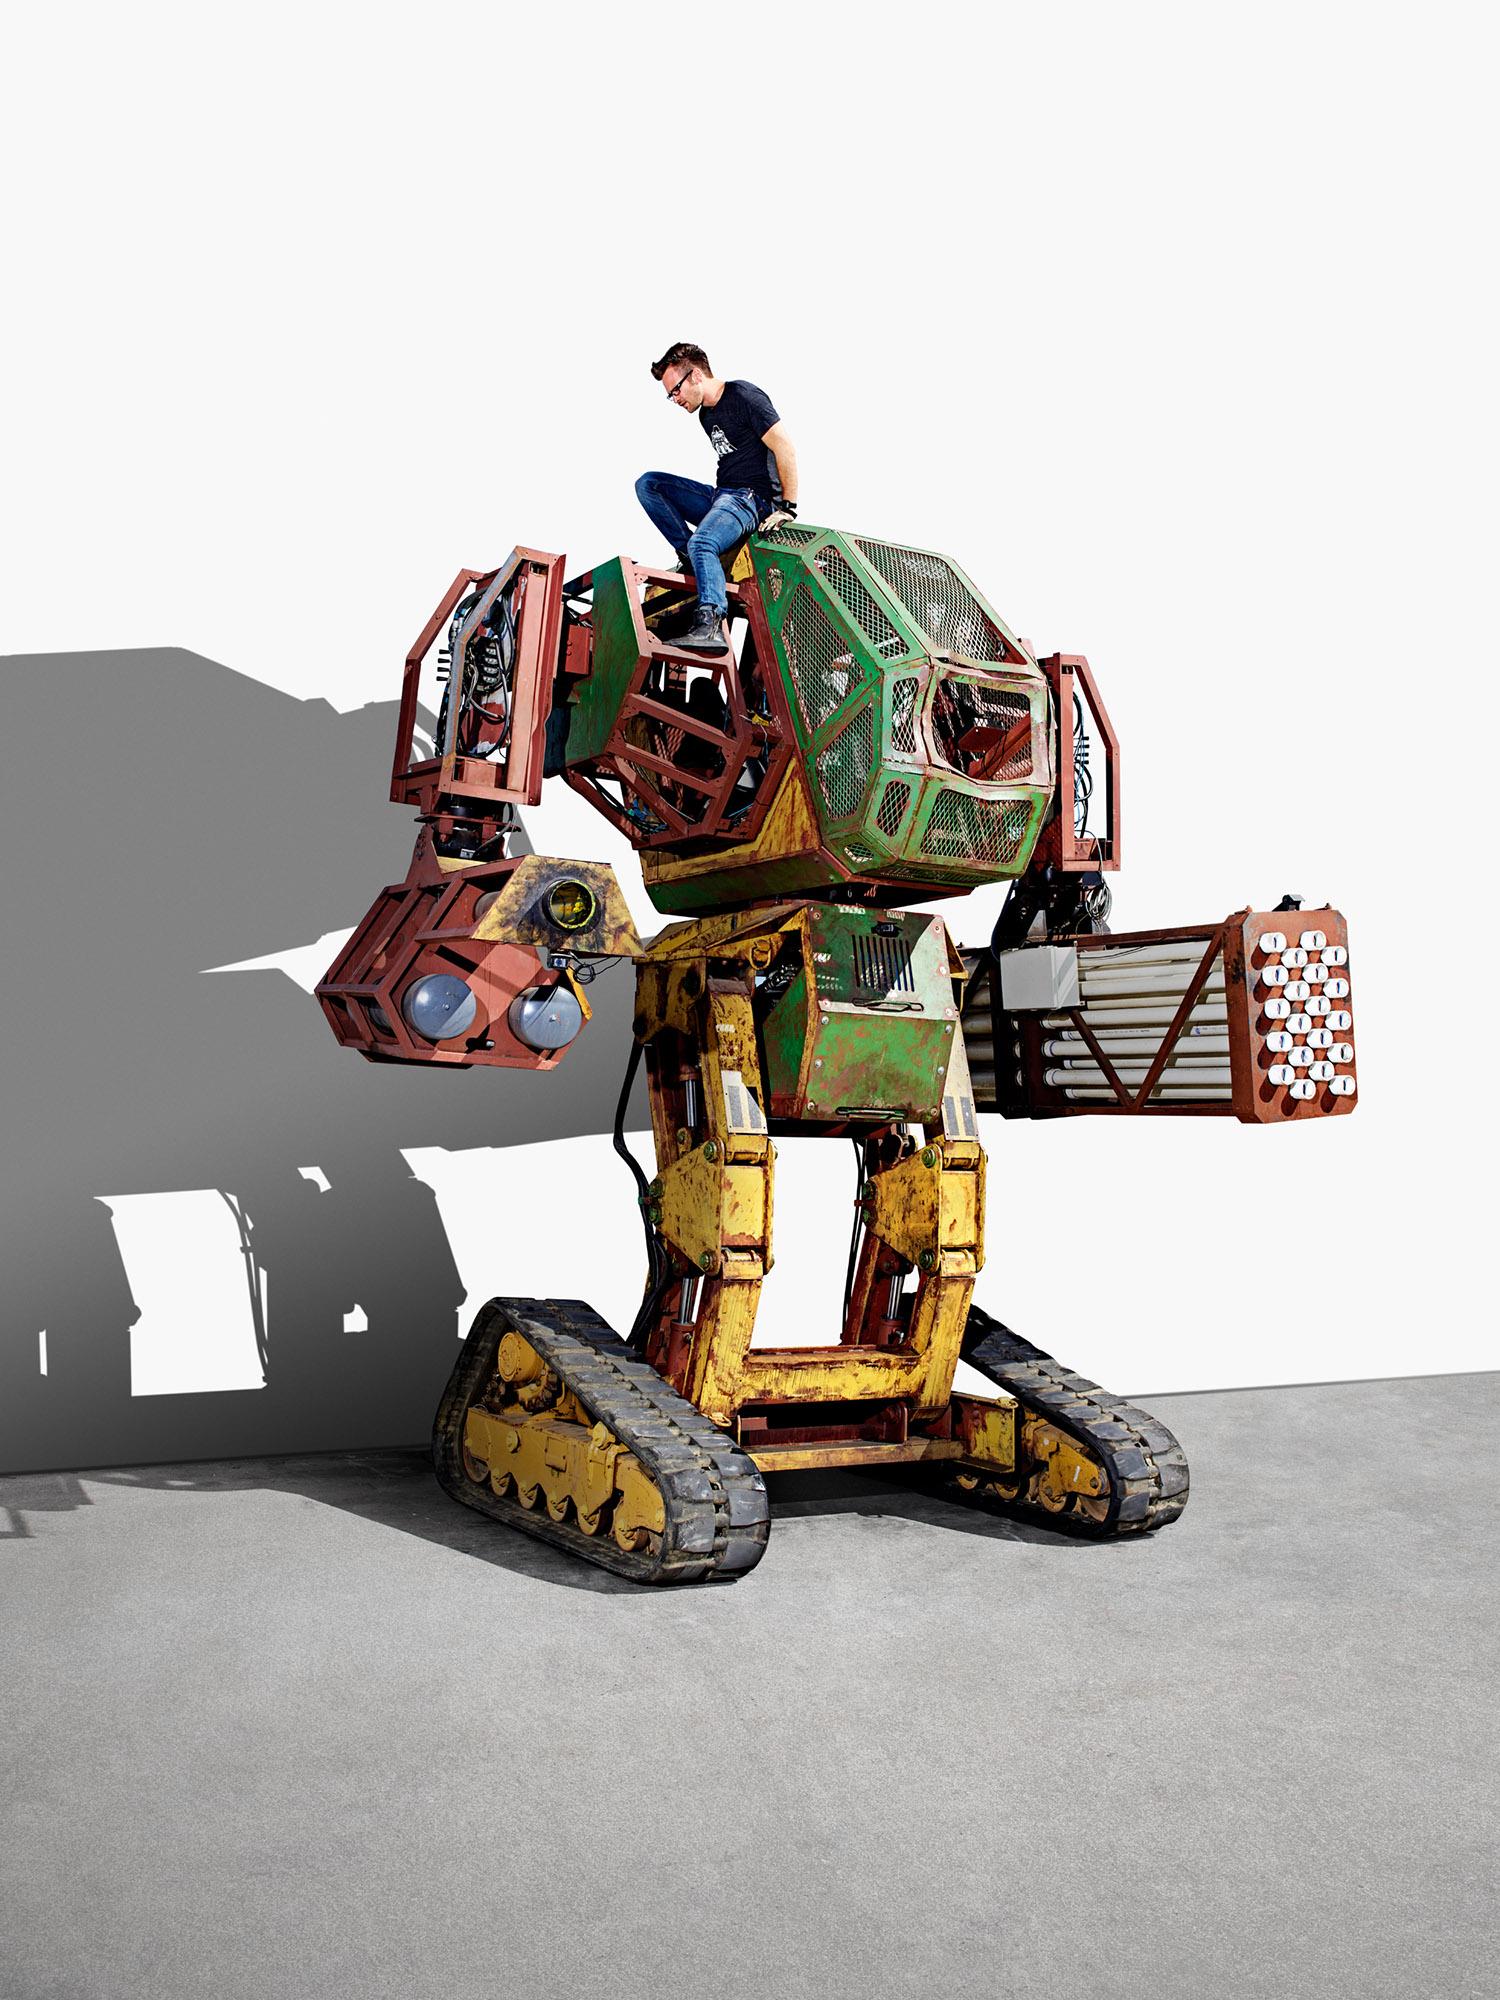 MegaBots Mark III, Oakland, California, 2016